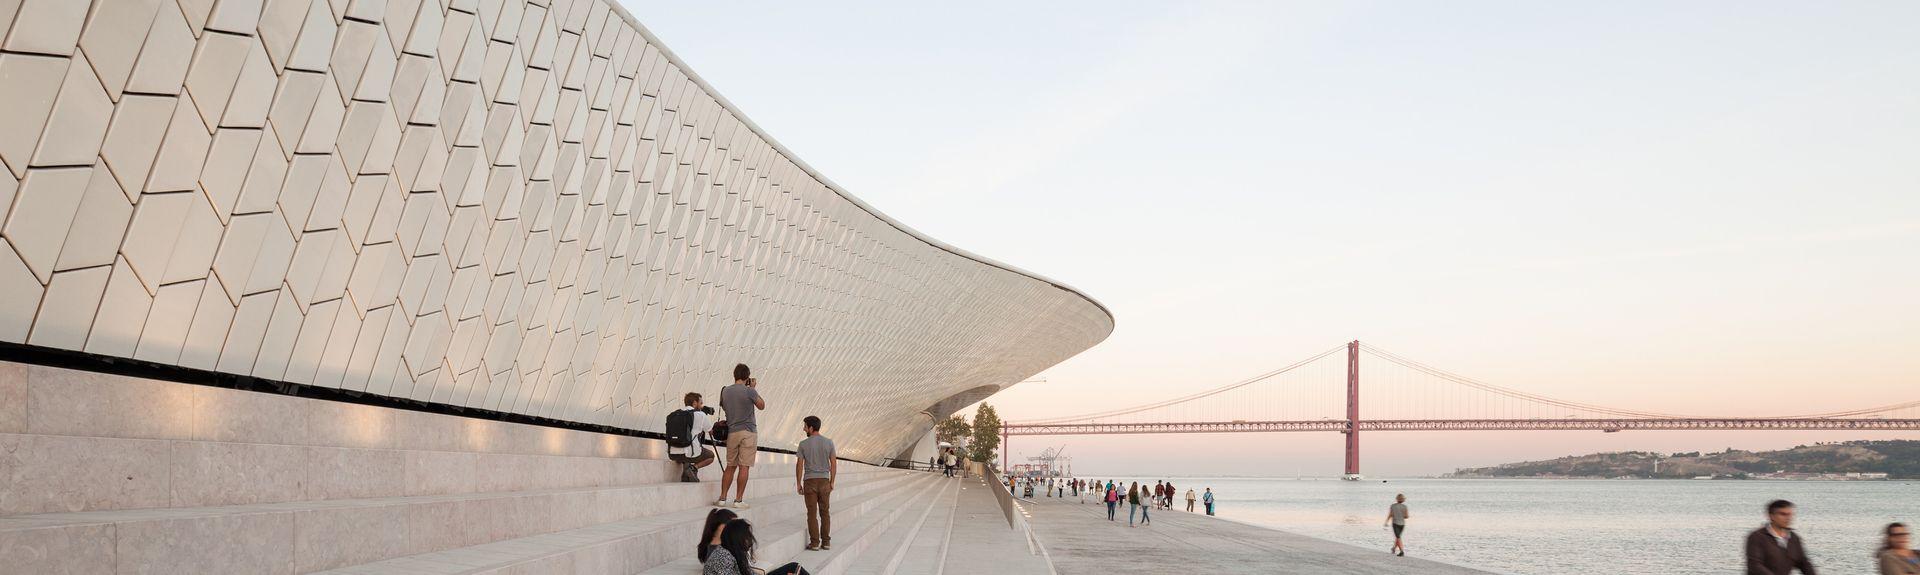 Baixa, Lisboa, Distrito de Lisboa, Portugal